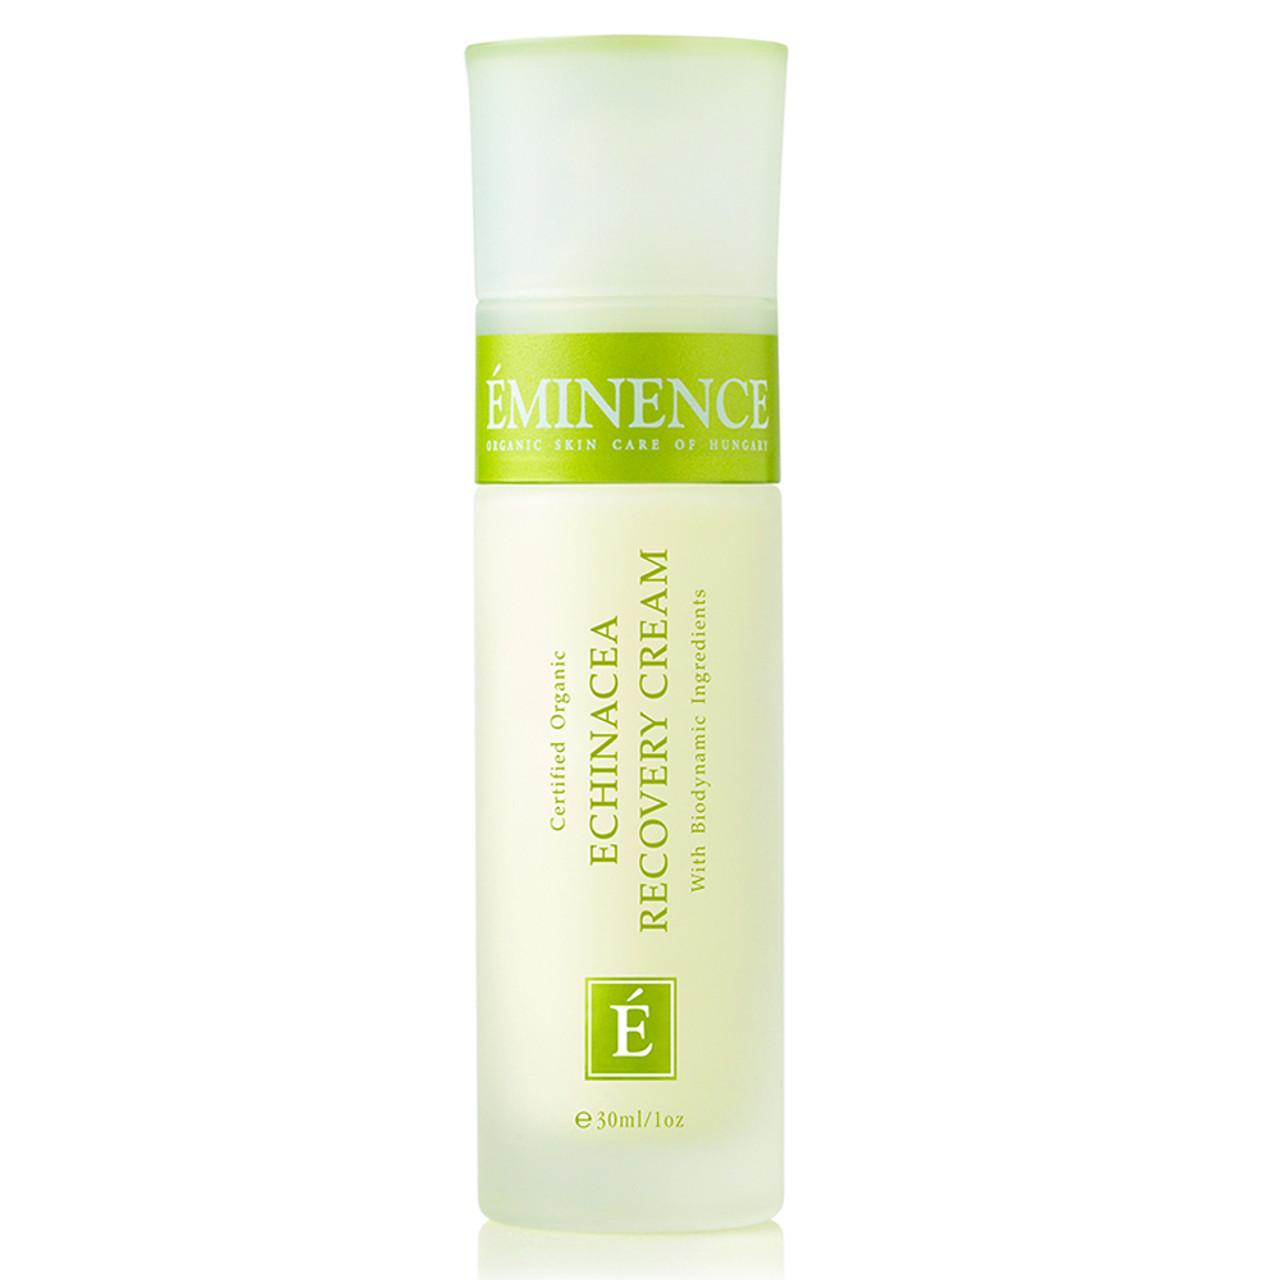 Eminence Echinacea Recovery Cream